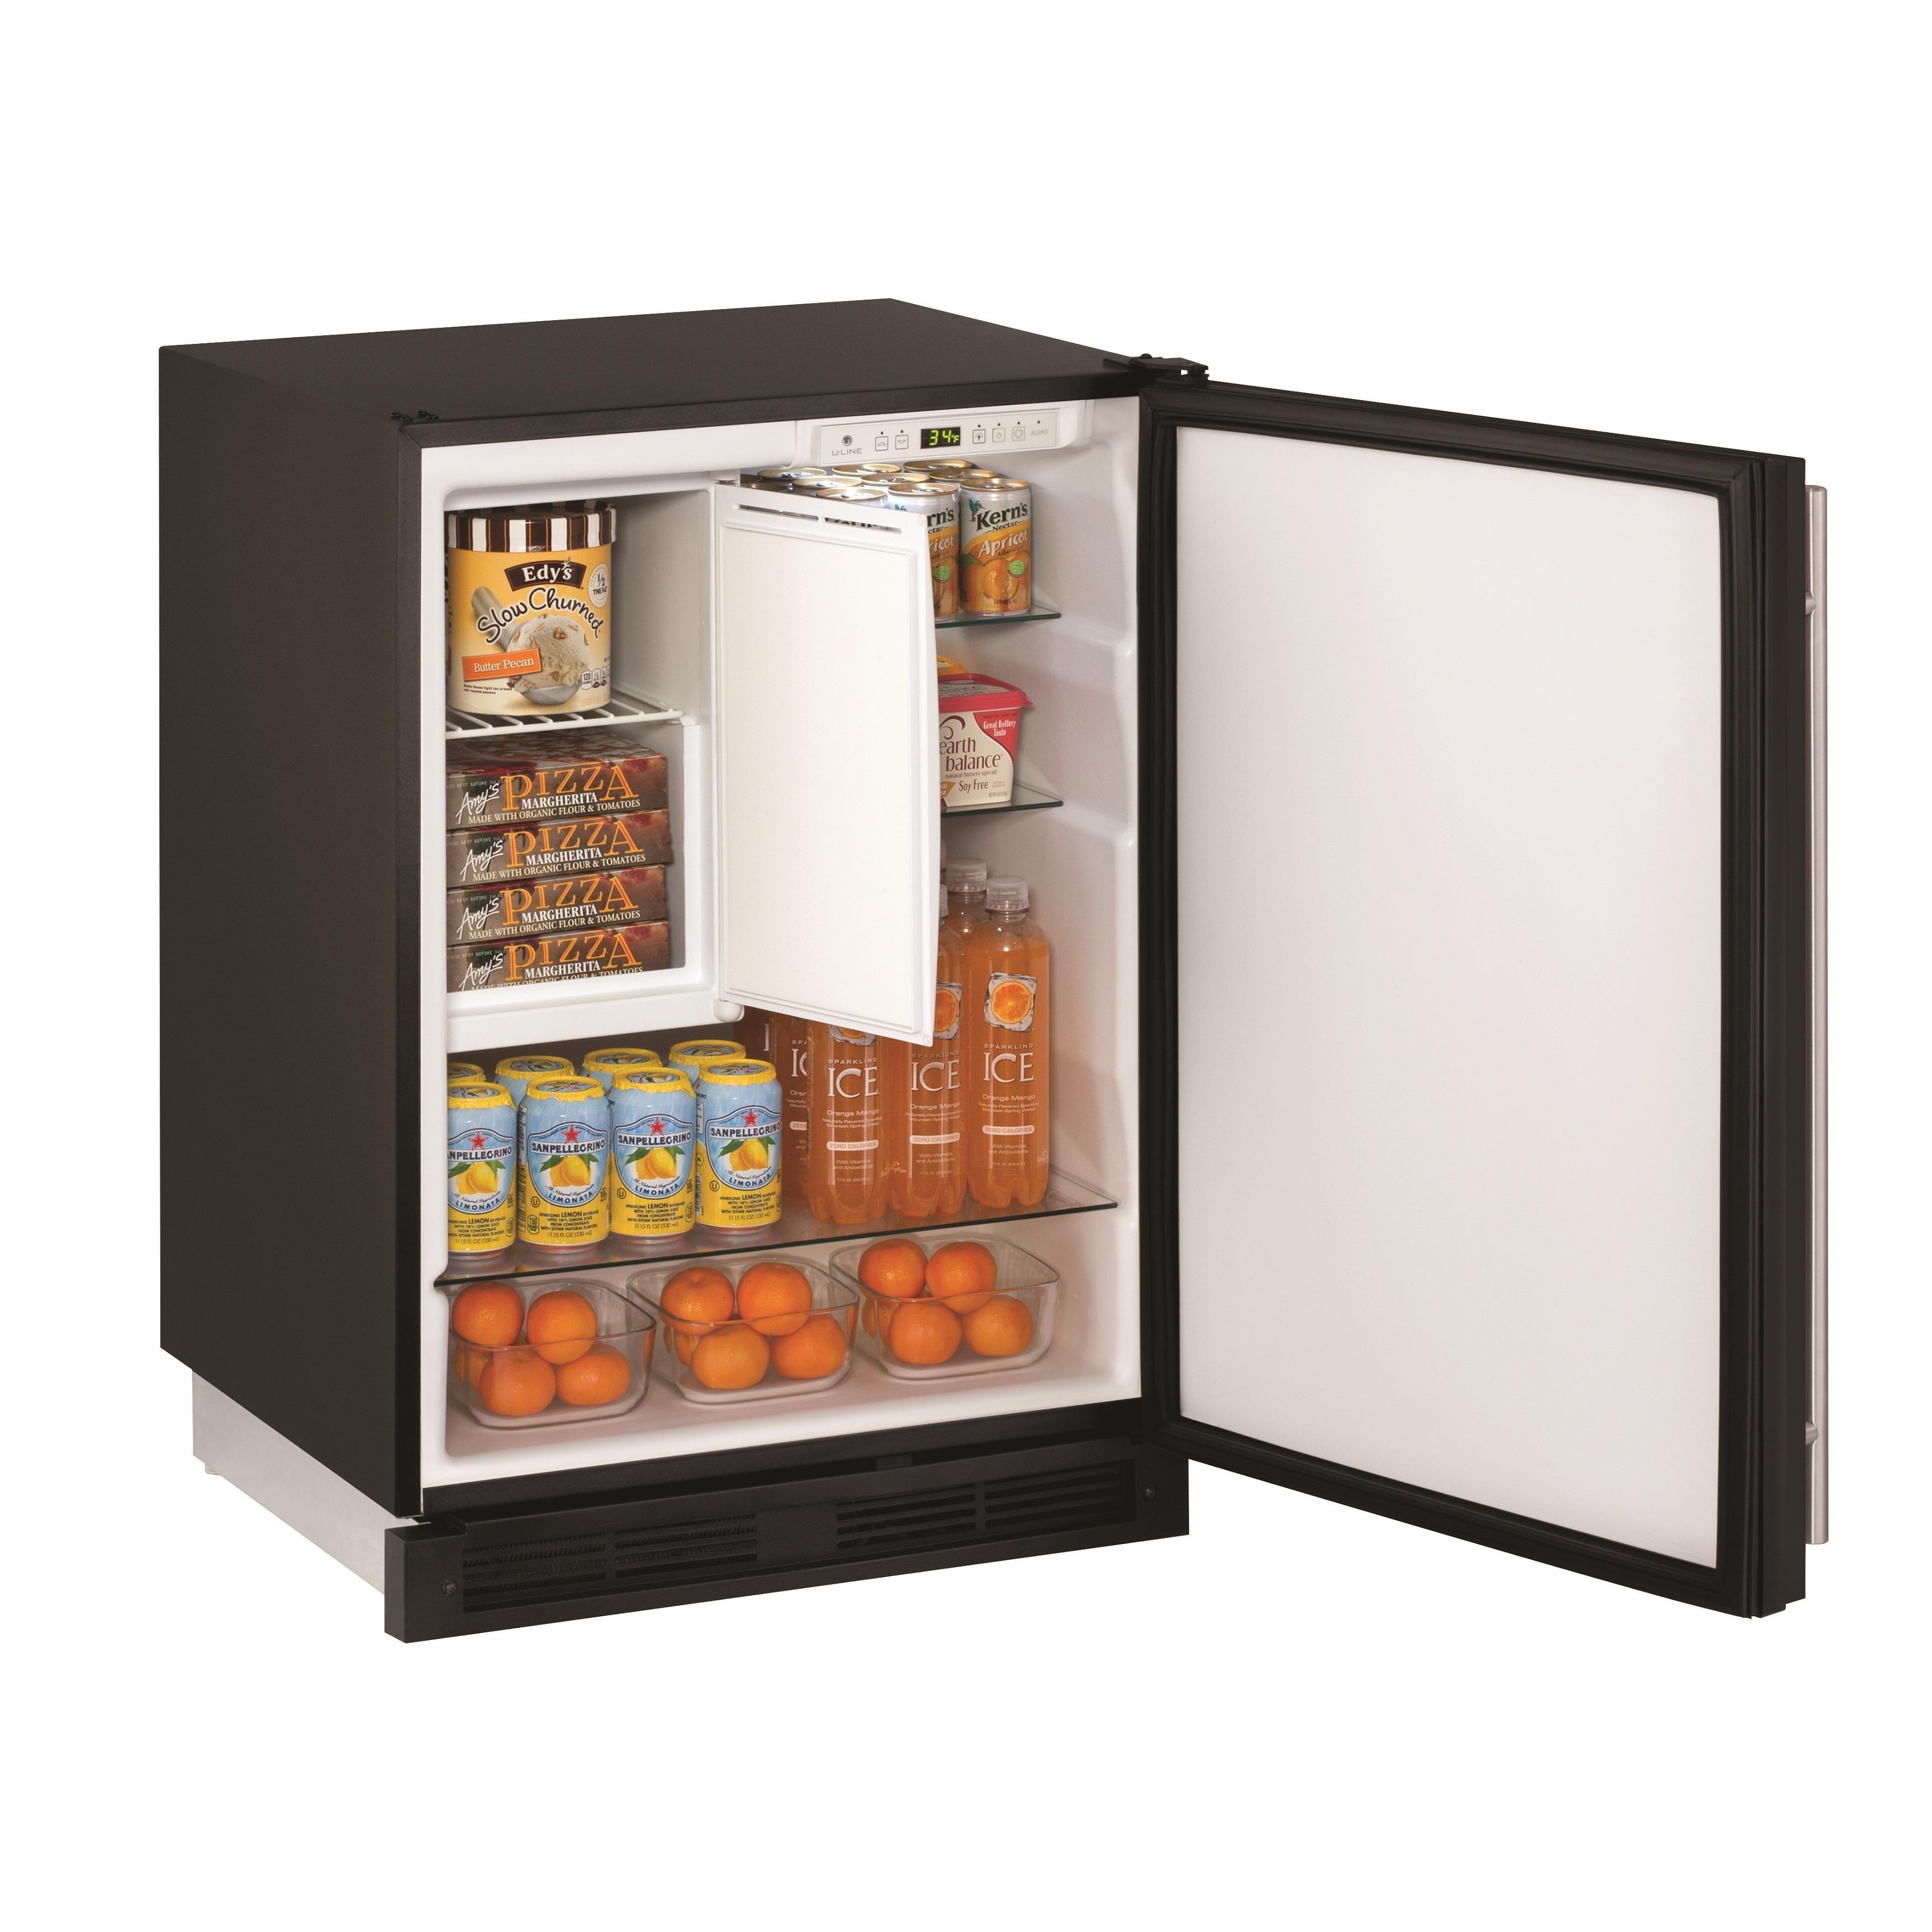 U-Line 1000 Series 1224 - 24 Inch Refrigerator/Freezer Co...